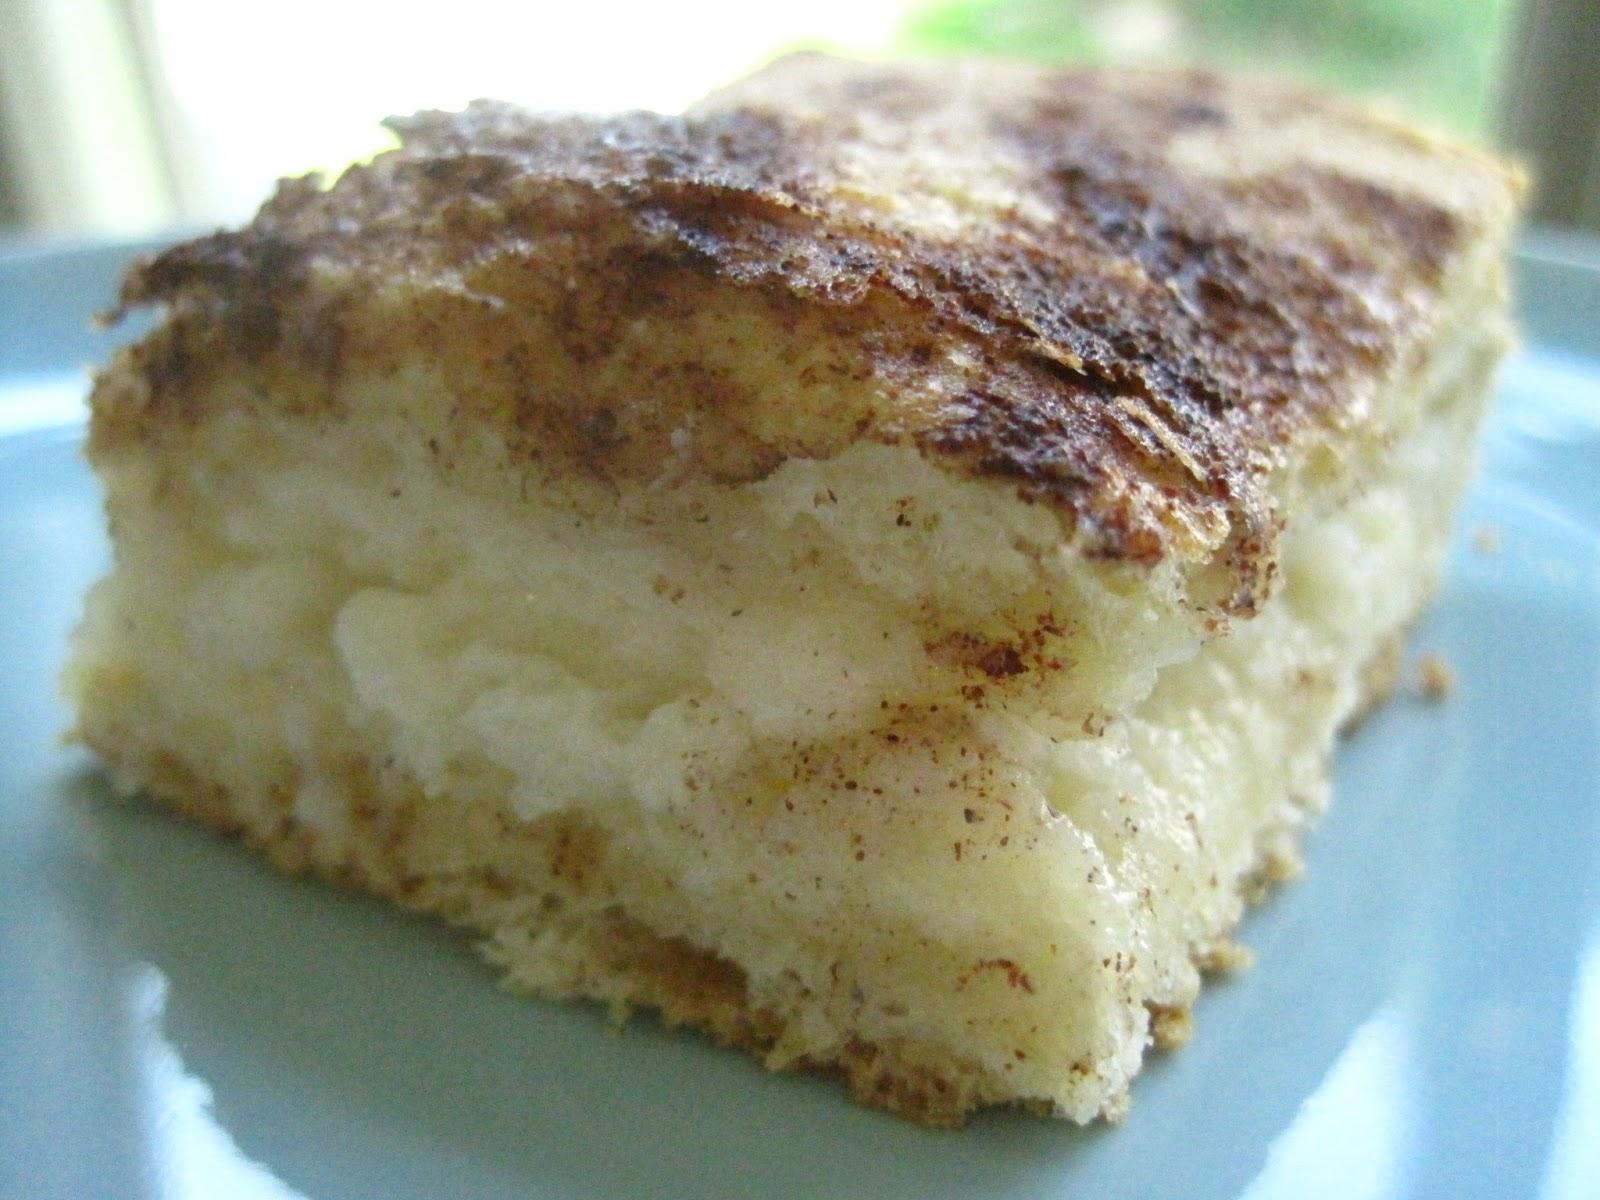 Crescent Cream Cheese Bars #2 | Mama Monson's Kitchen